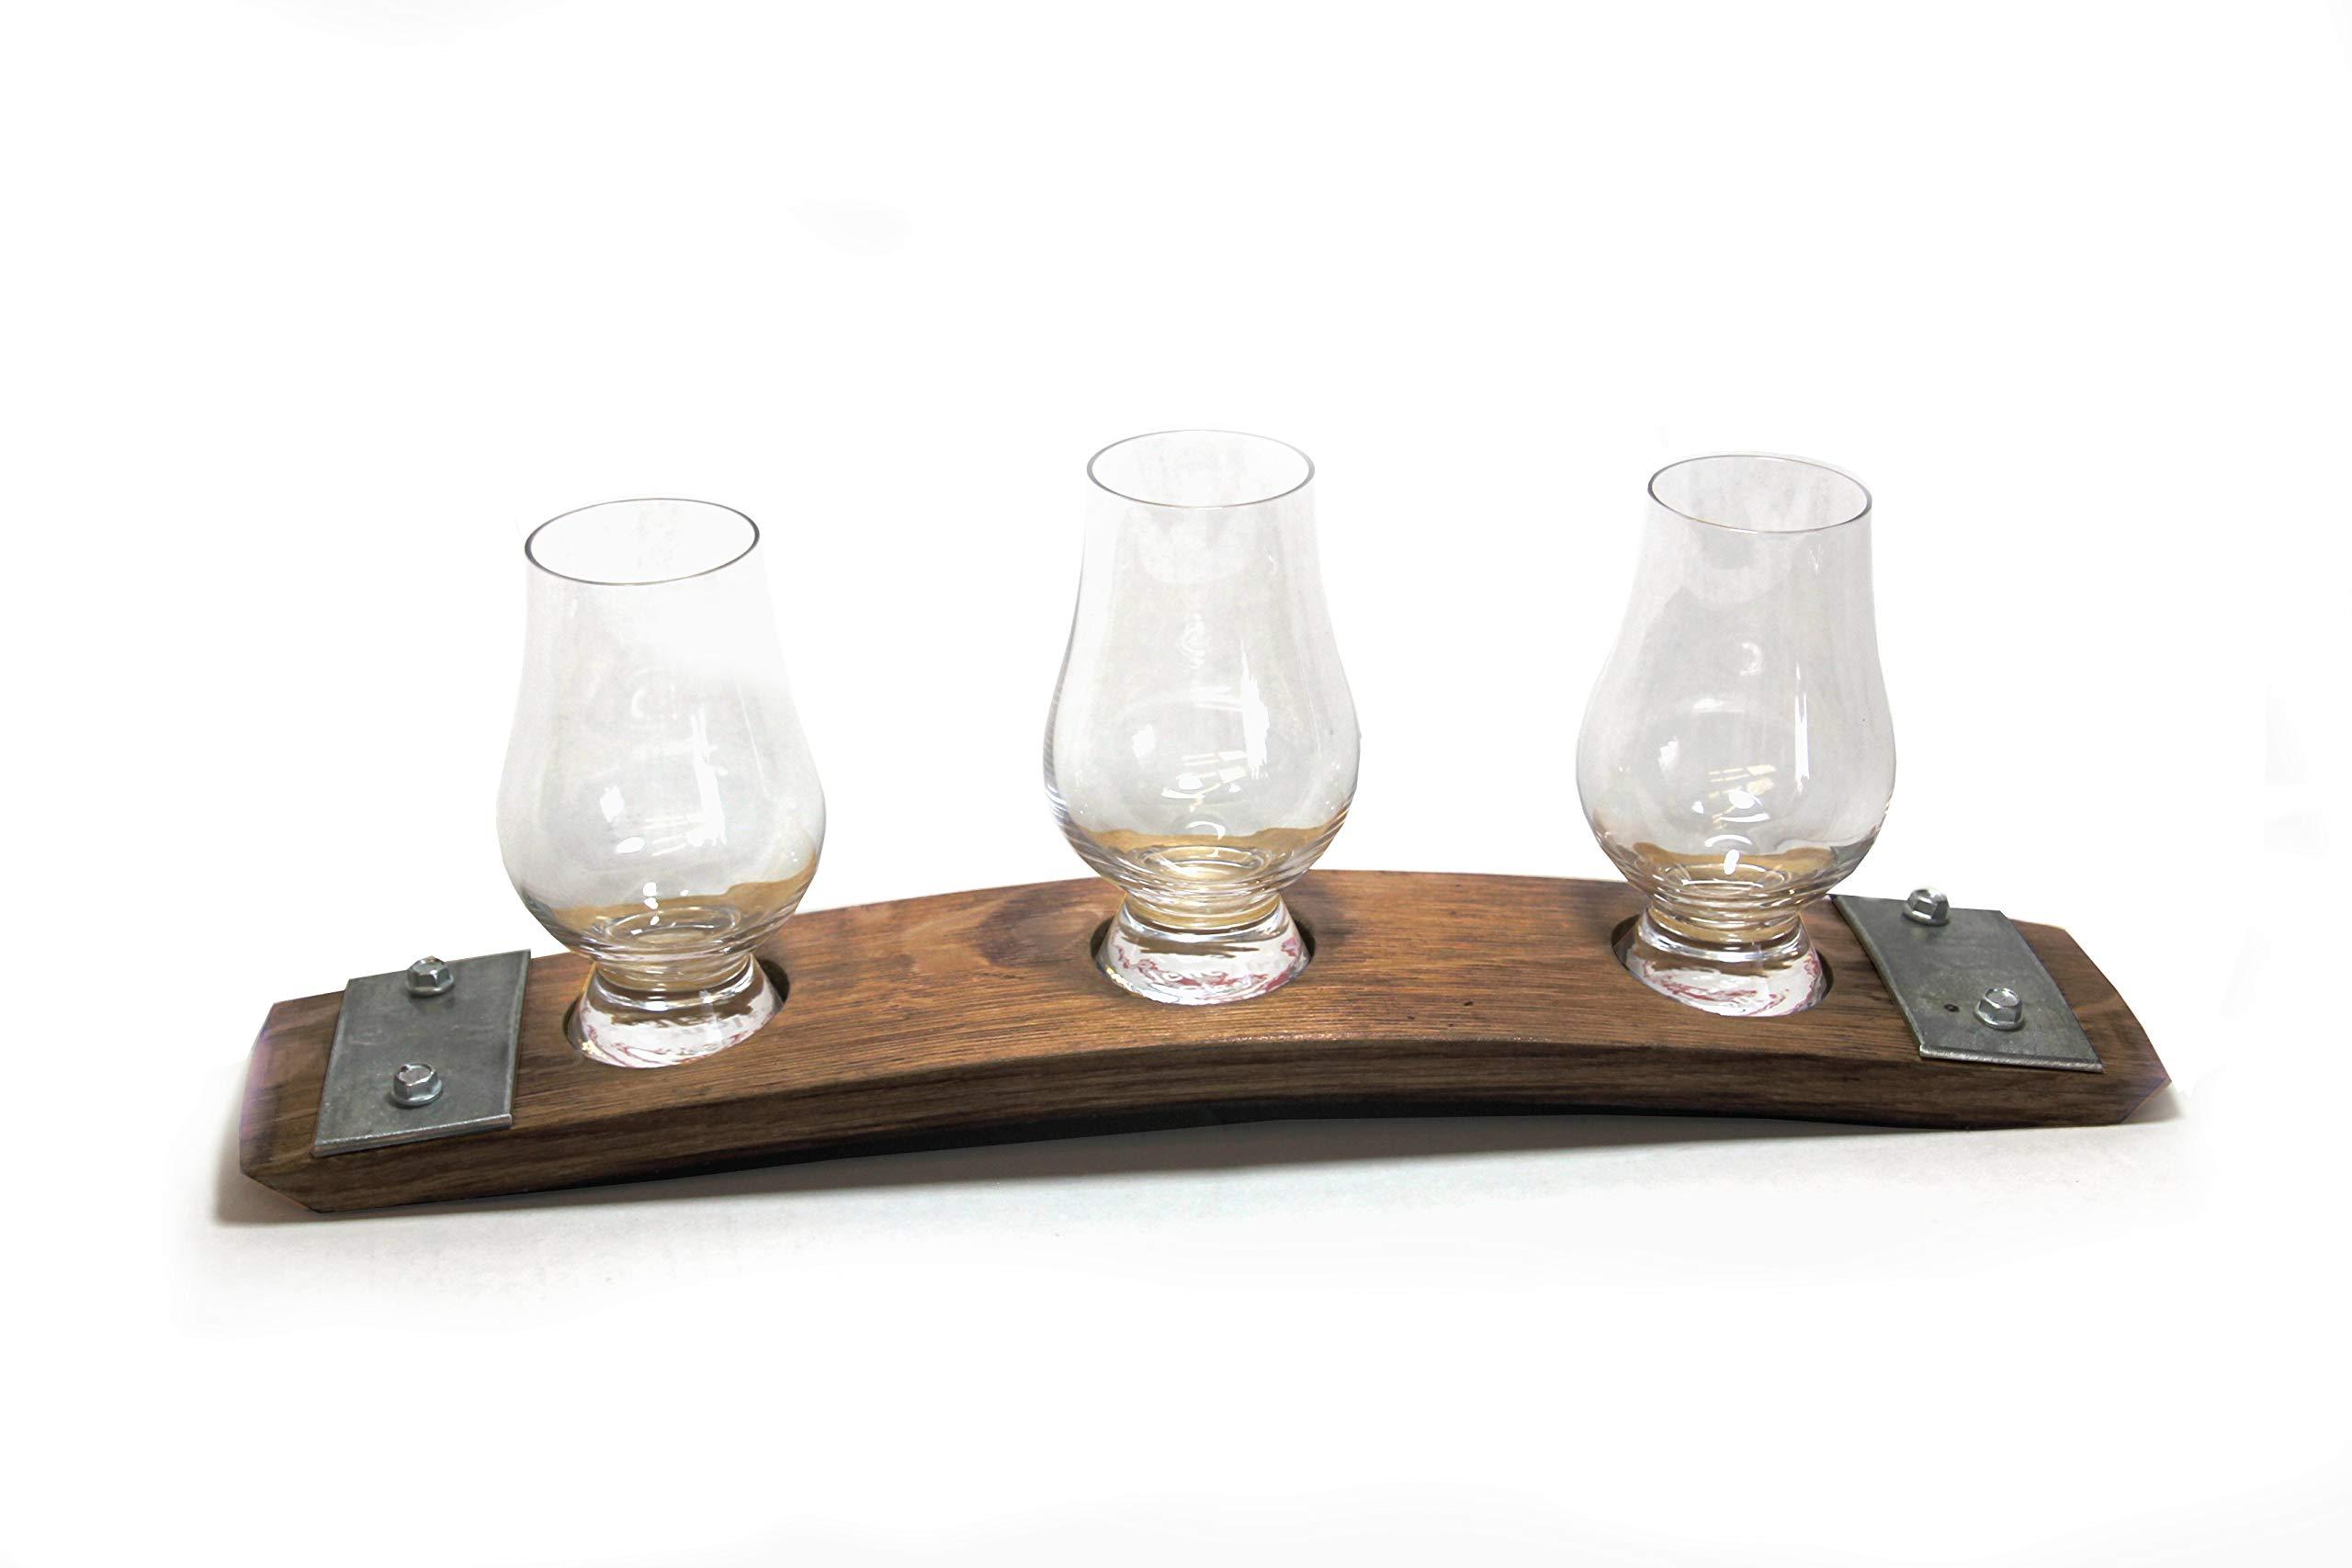 Premium Barrel Stave Whiskey Flight, Scotch Flight, Bourbon Flight, Crystal Glencairn Glass Flight (Dark Walnut)